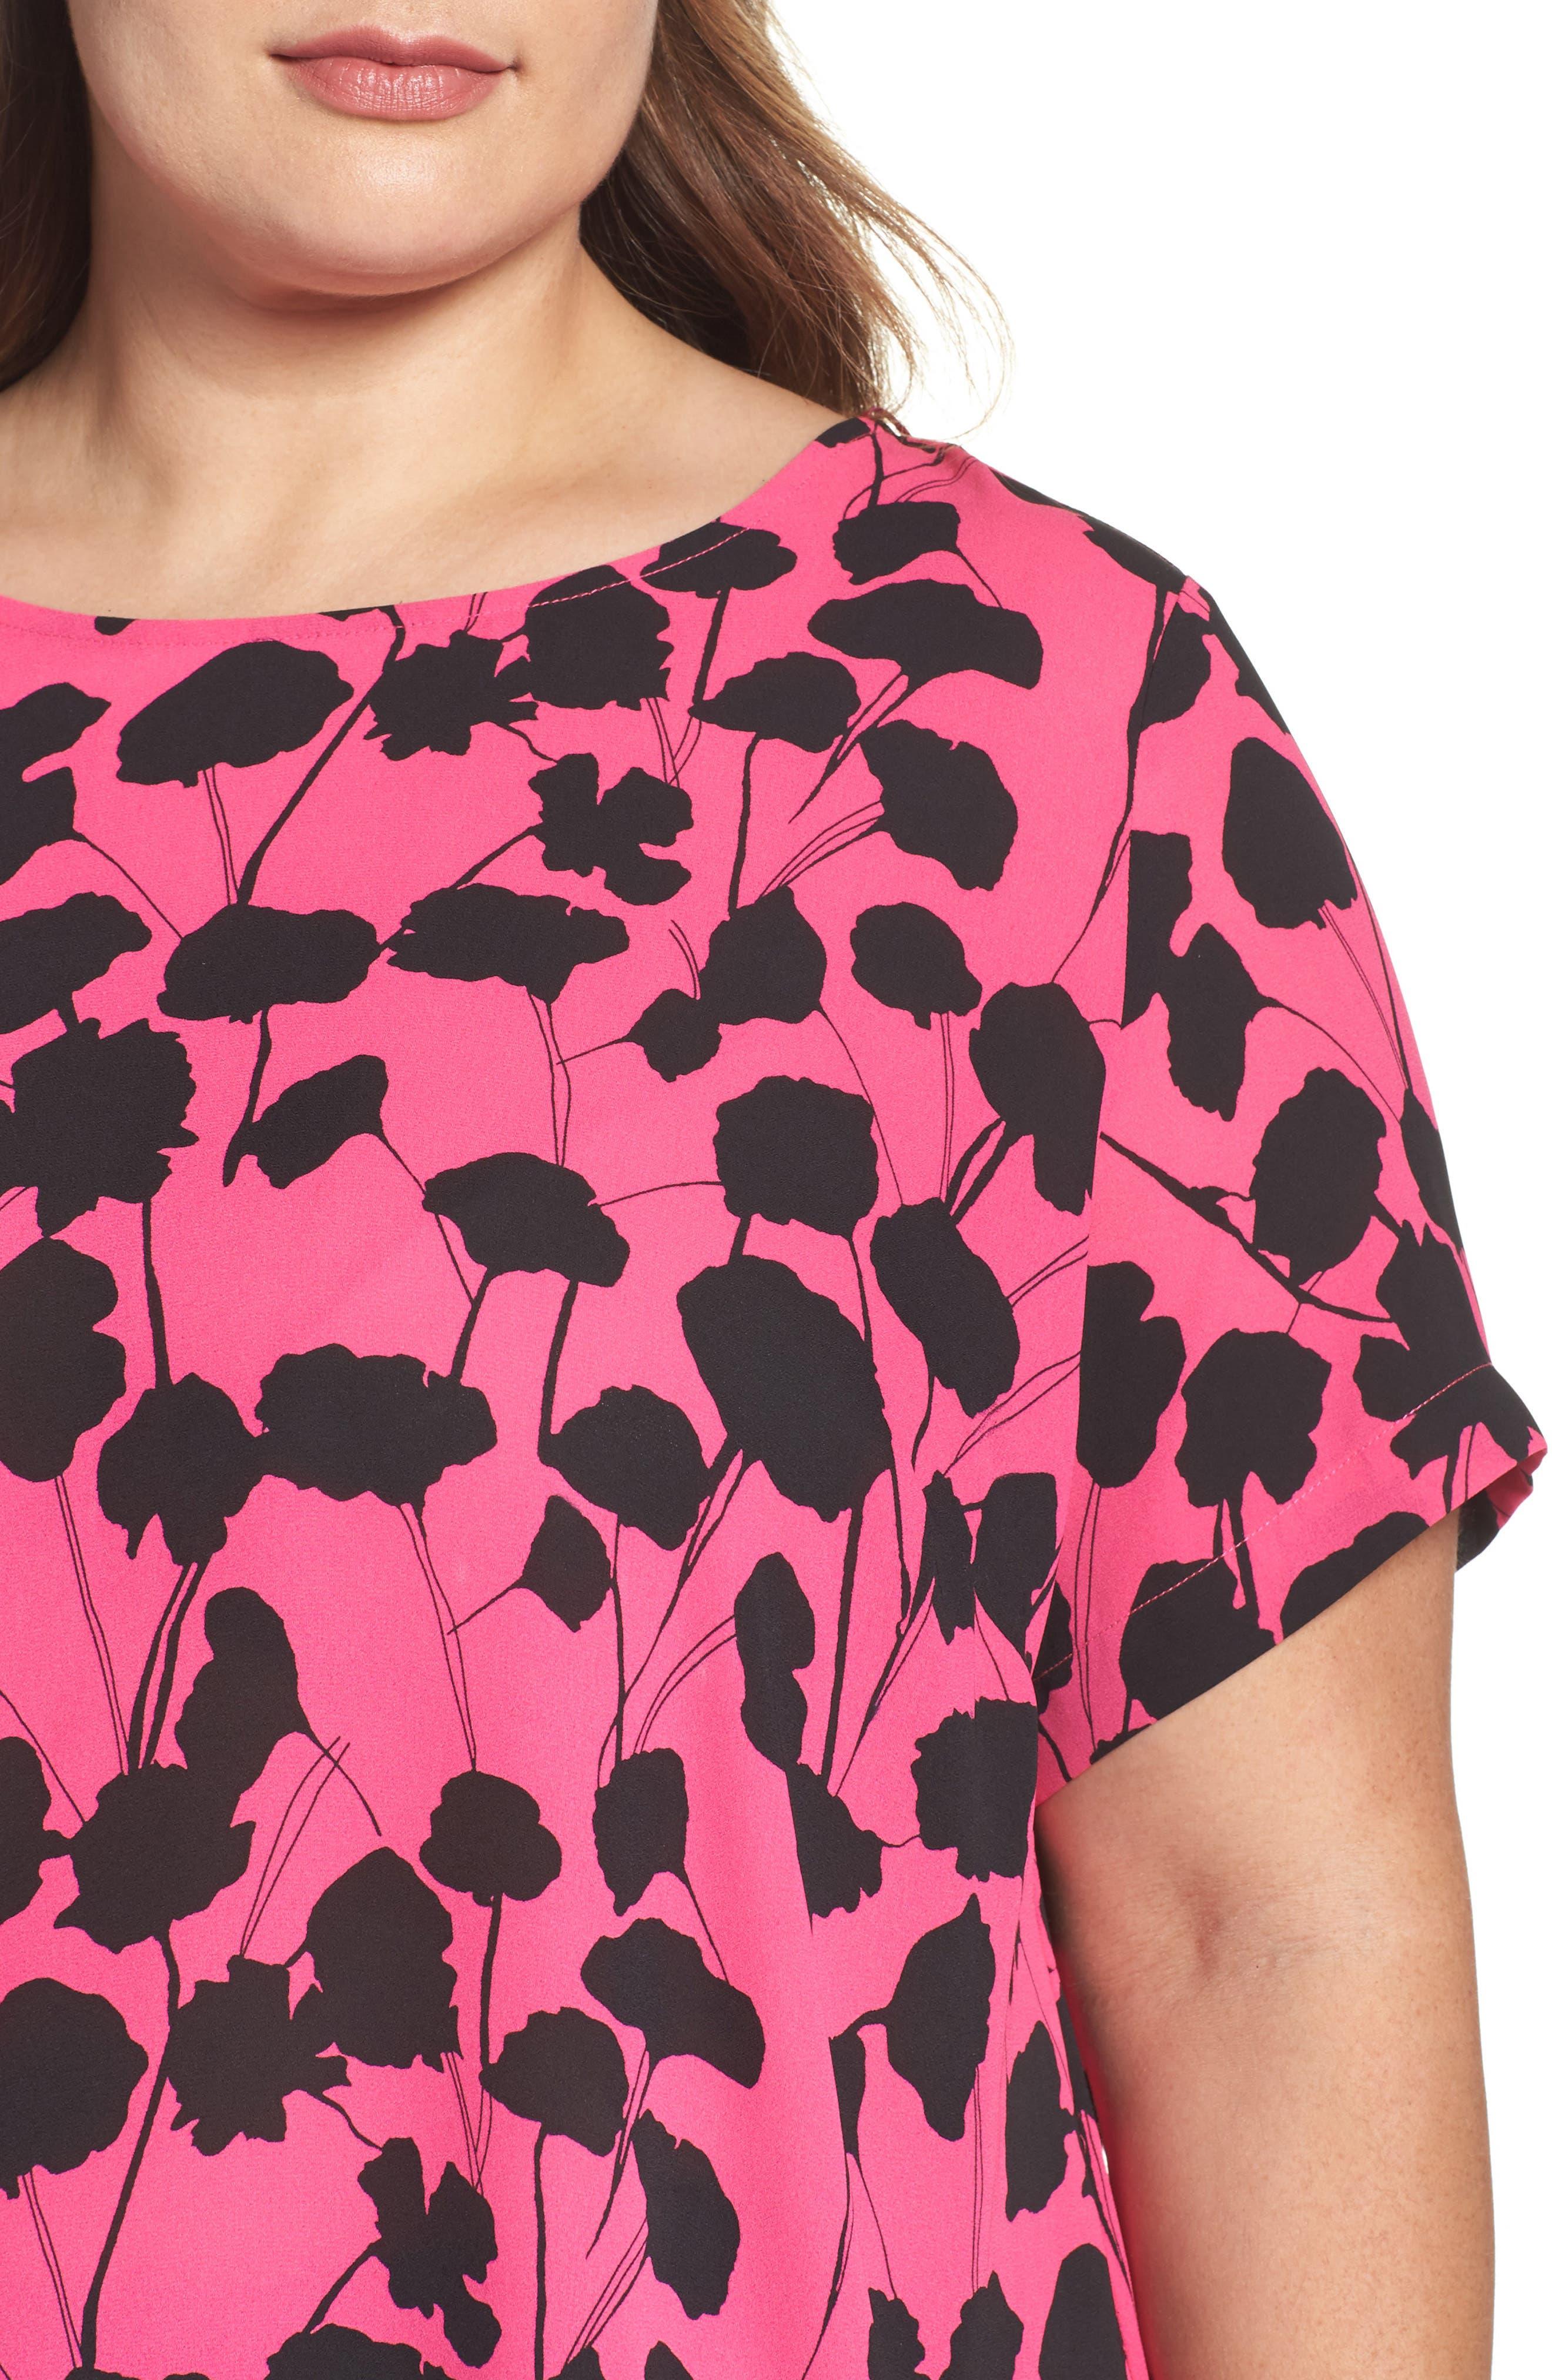 VINCE CAMUTO, Elegant Blossom Chiffon Tunic, Alternate thumbnail 4, color, 650